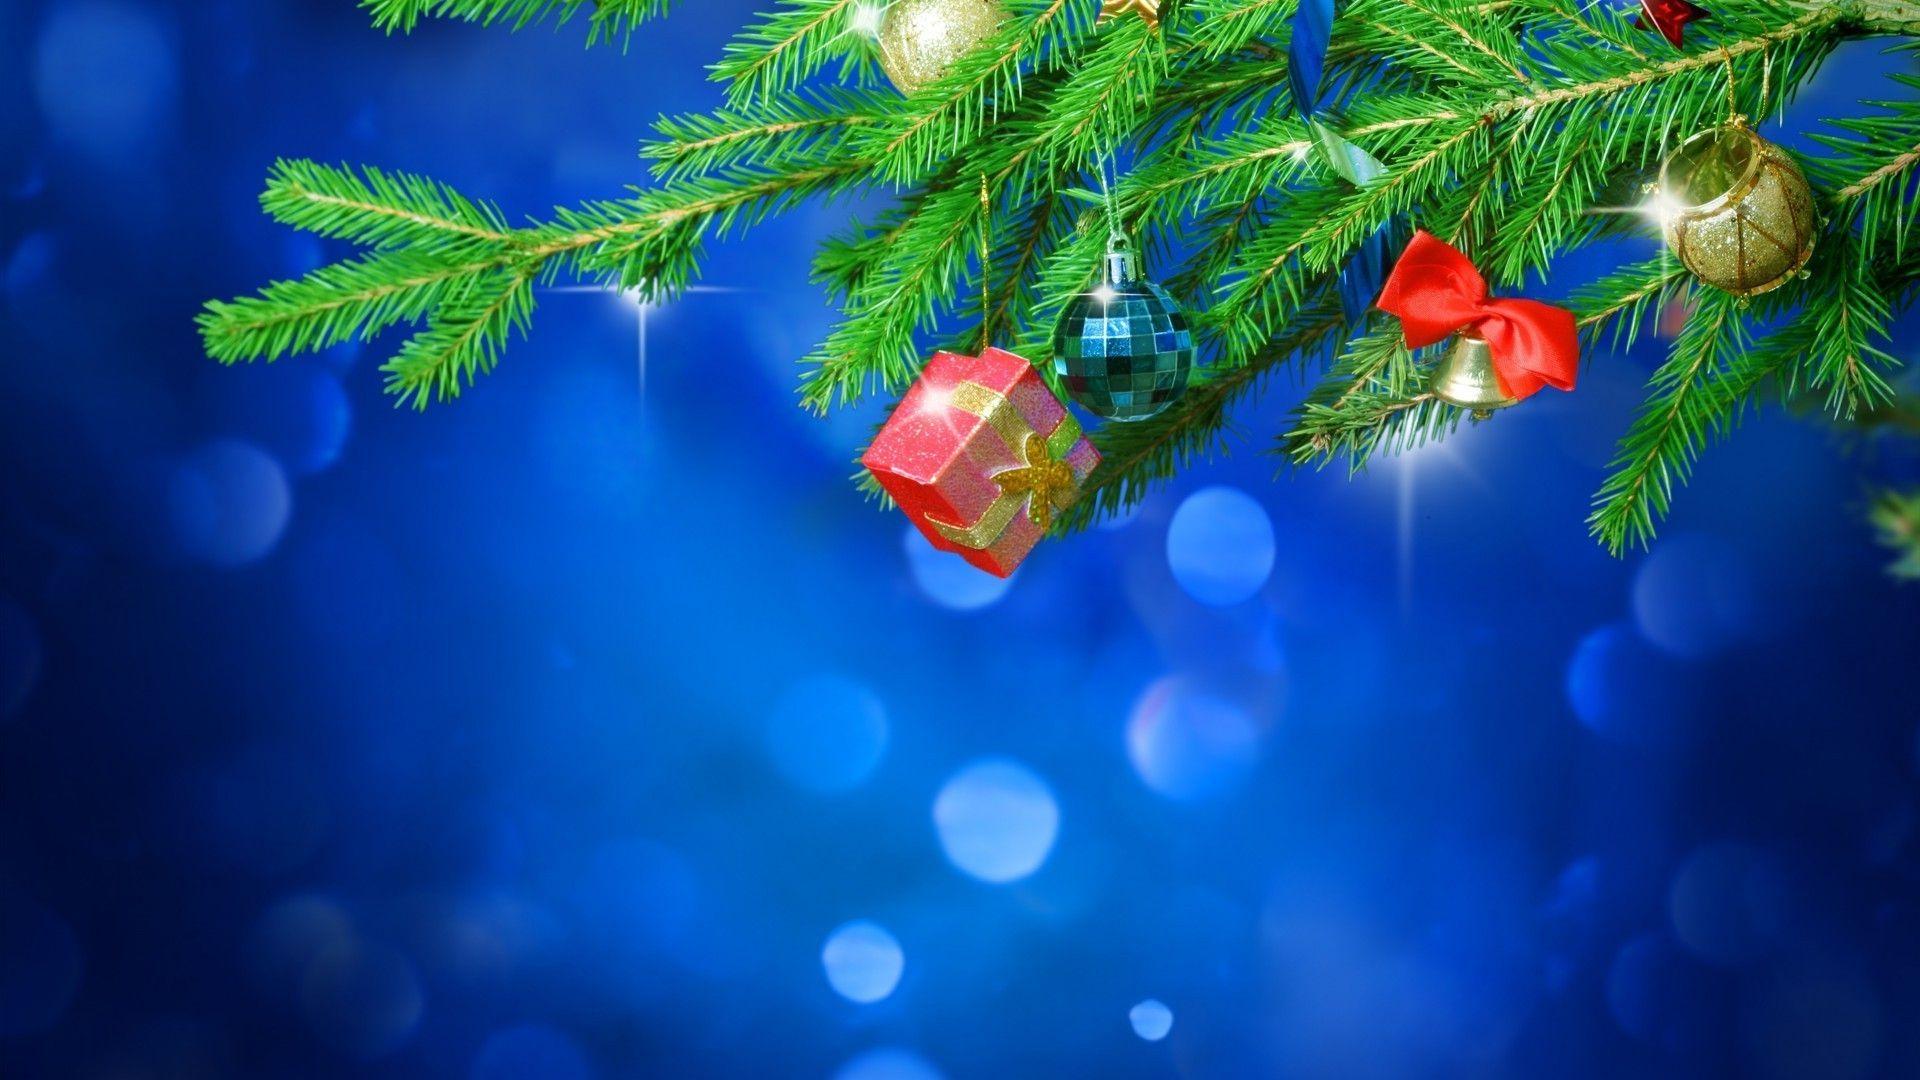 Christmas Tree vertical wallpaper hd